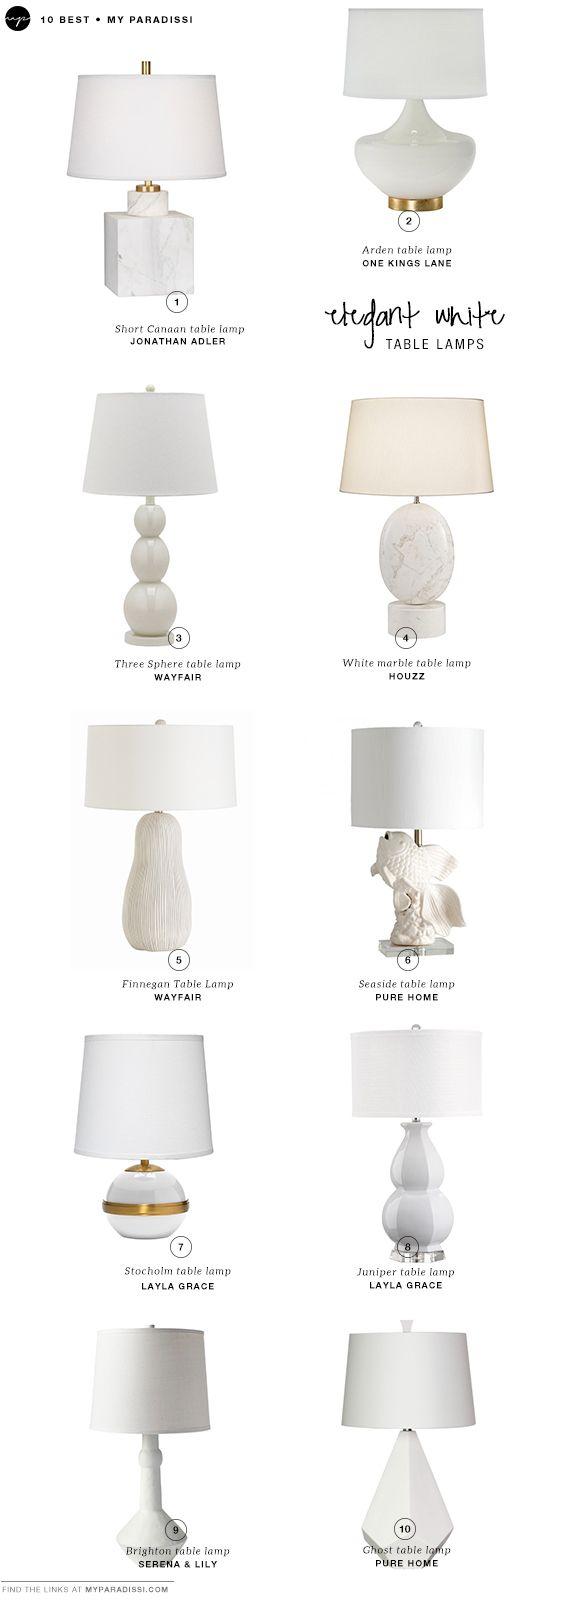 10 BEST: Elegant white table lamps | White table lamp, Elegant and ...